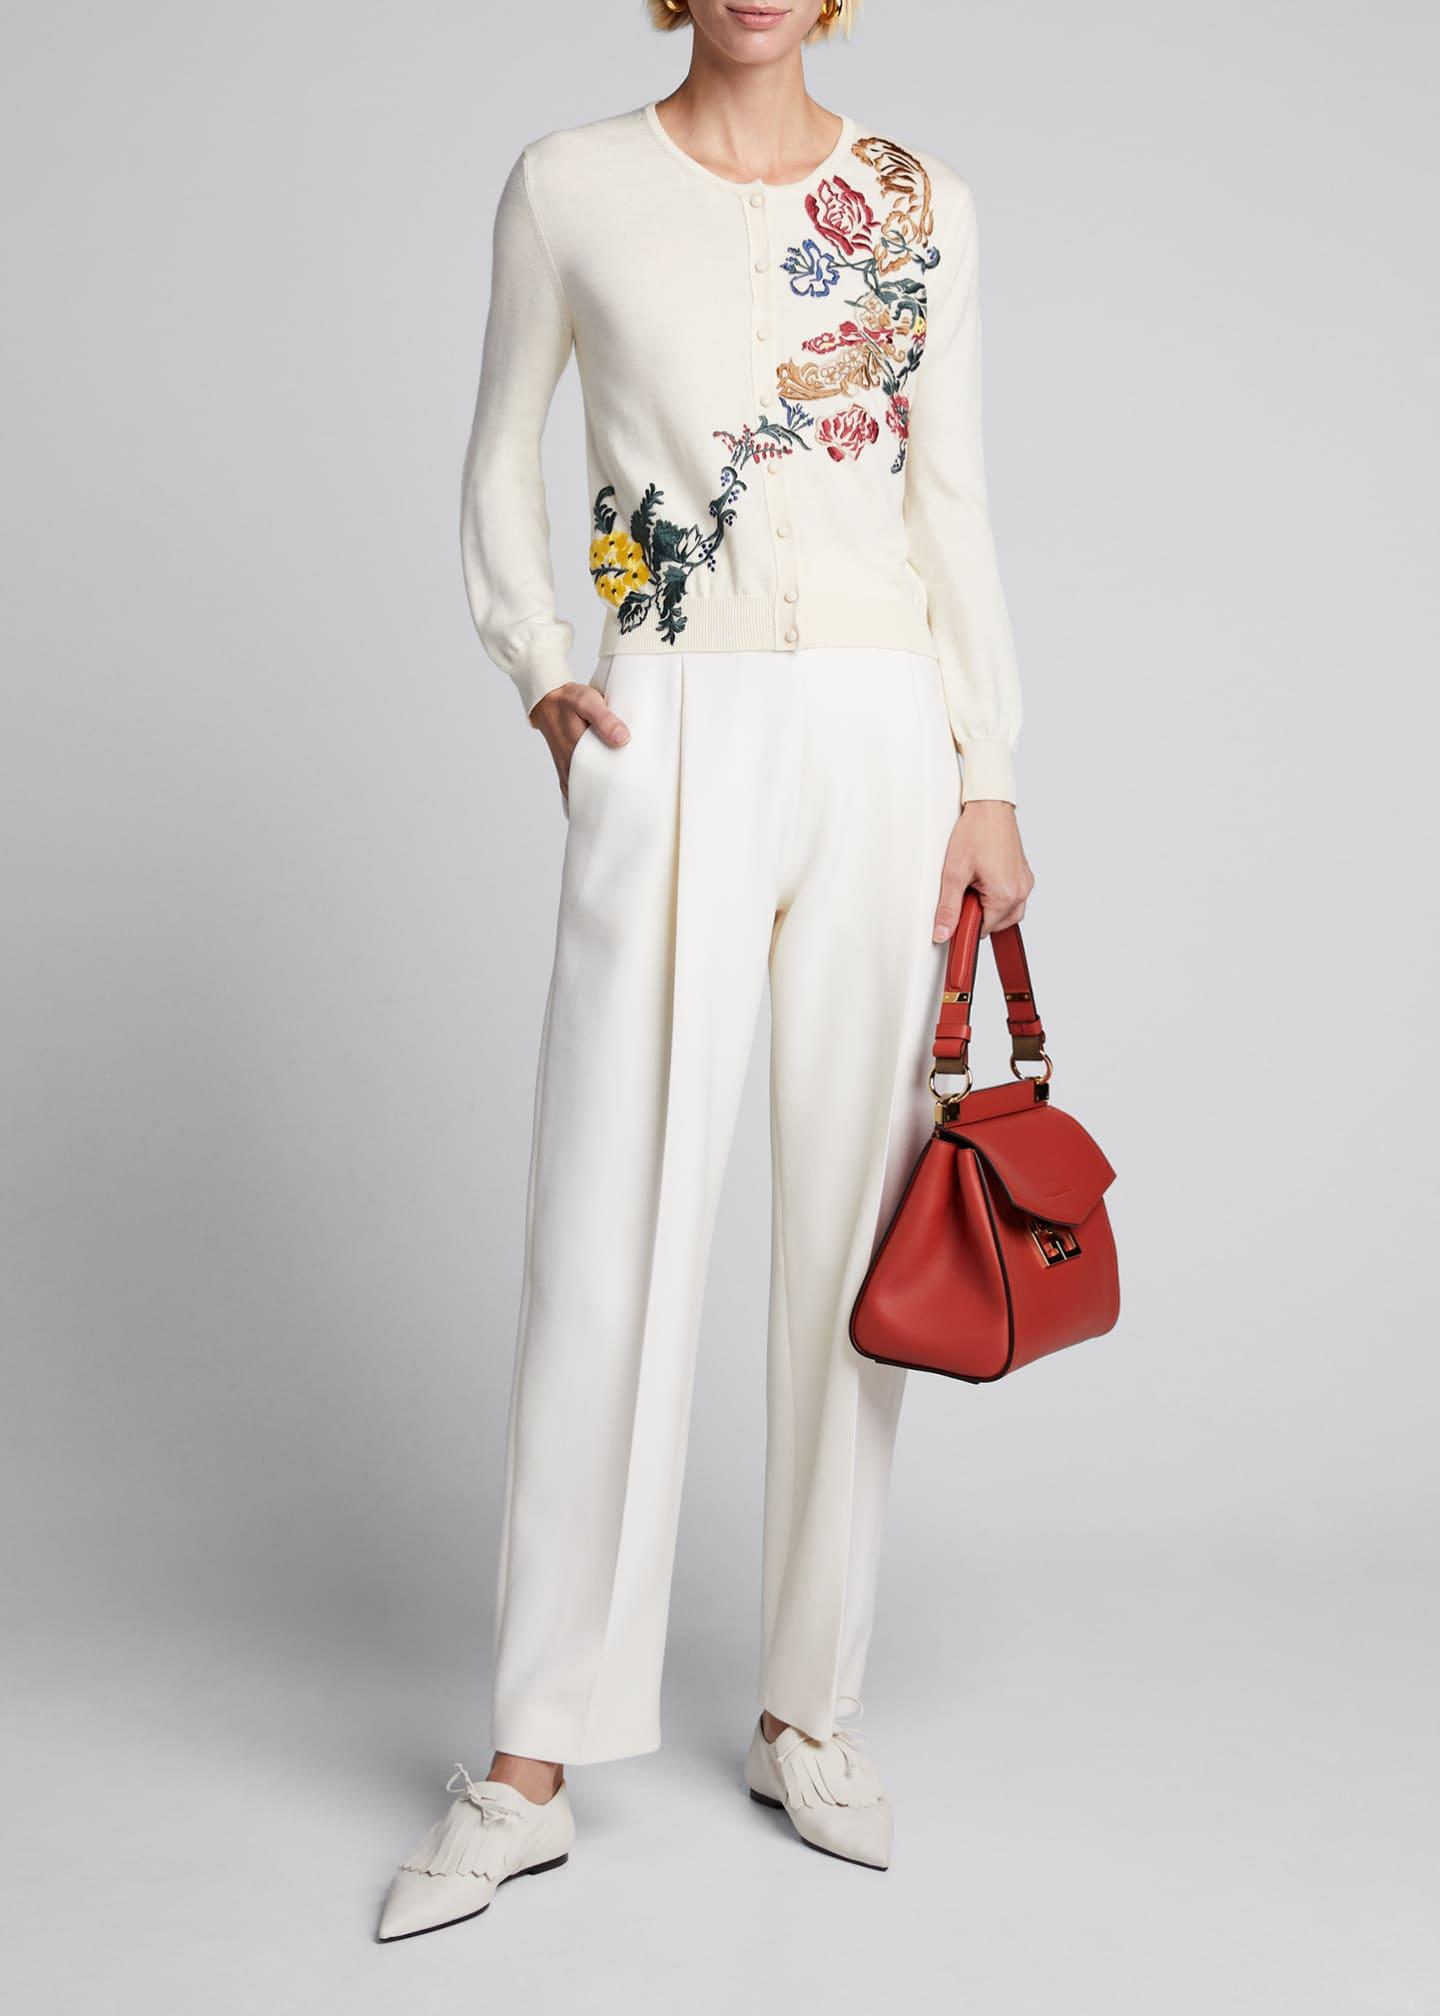 Oscar de la Renta Floral Embroidered Button Front